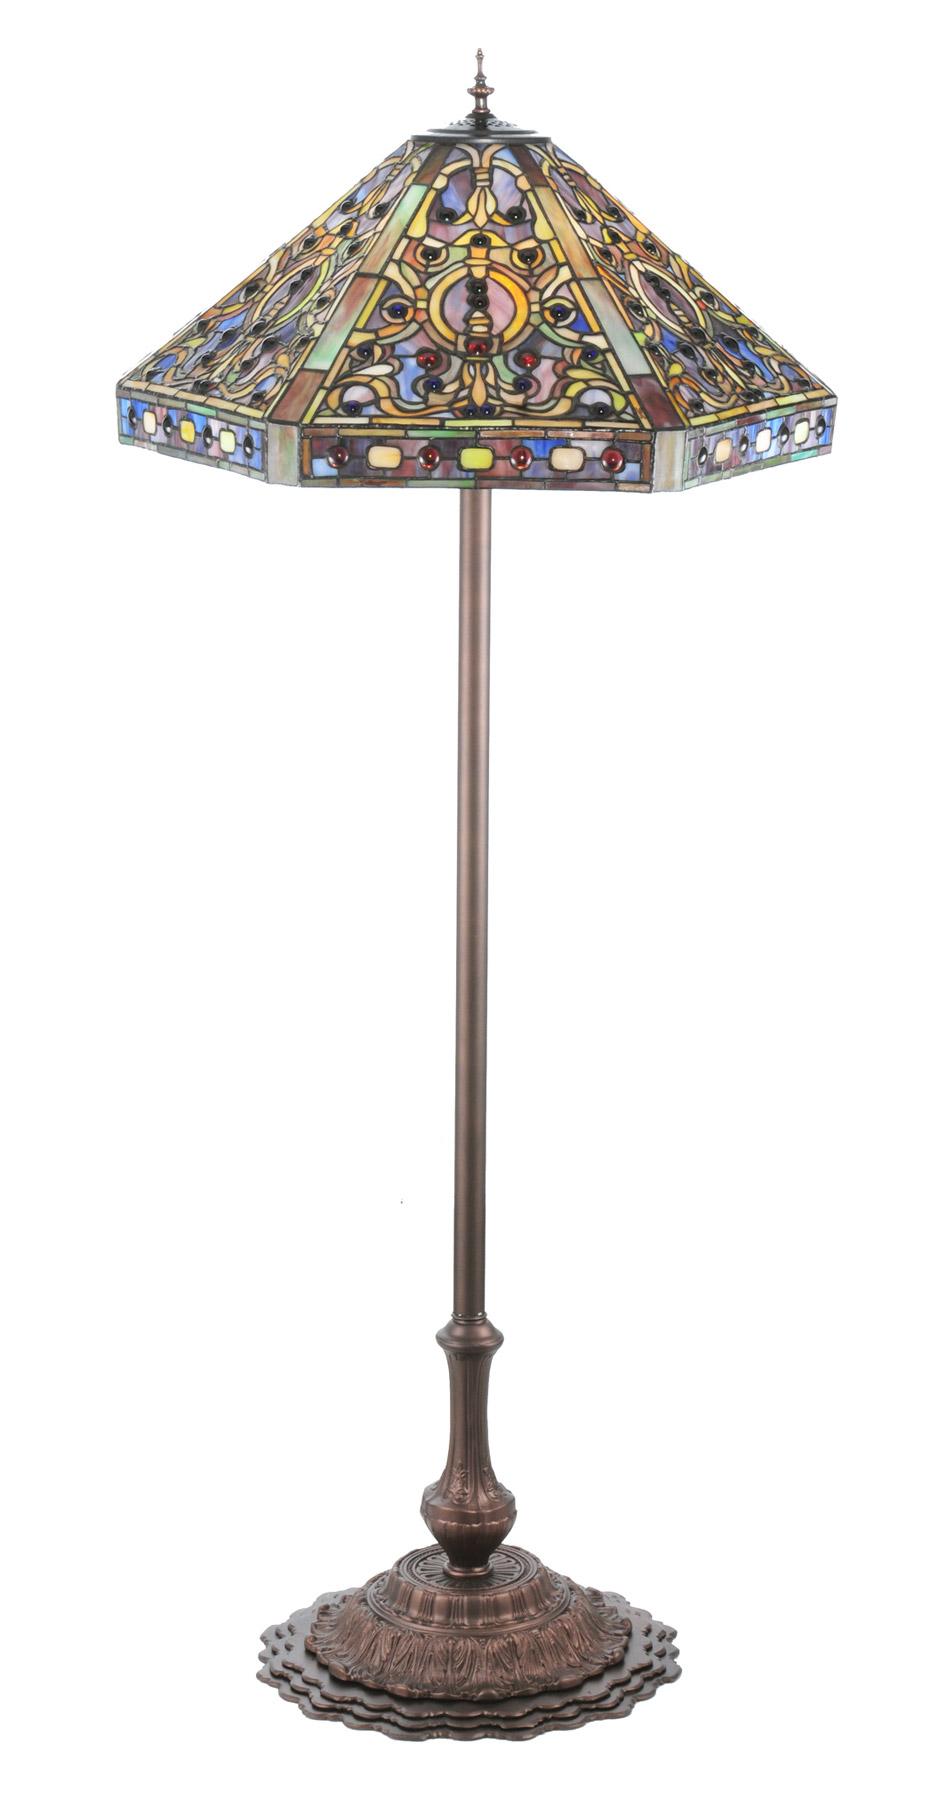 Meyda 107863 tiffany elizabethan floor lamp